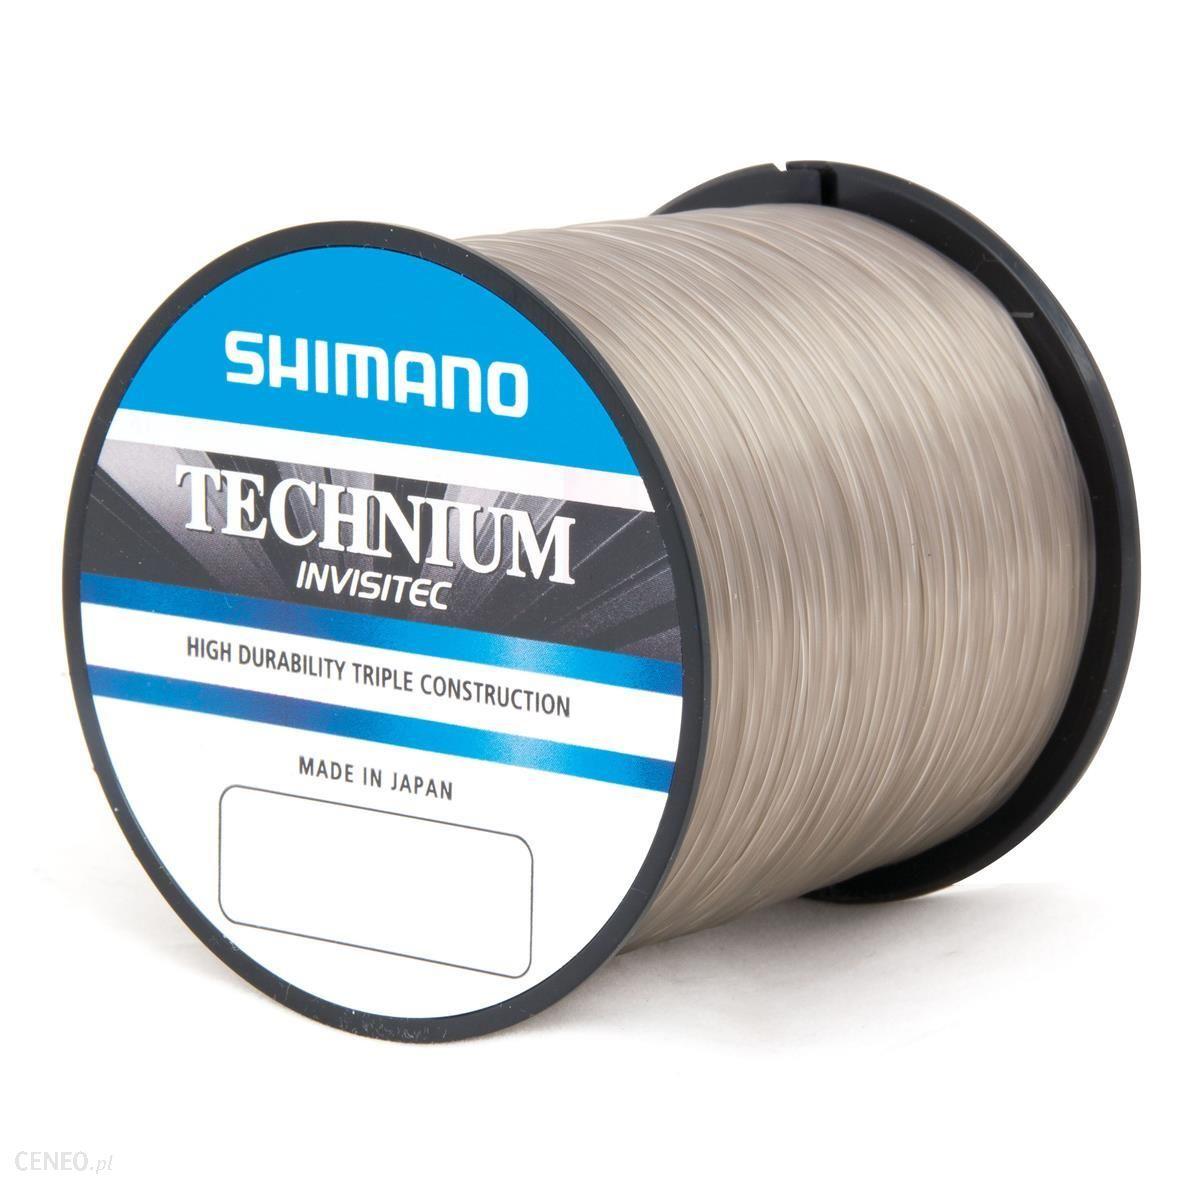 Shimano Technium Invisitec 790 M 0.35Mm Żyłki Mono